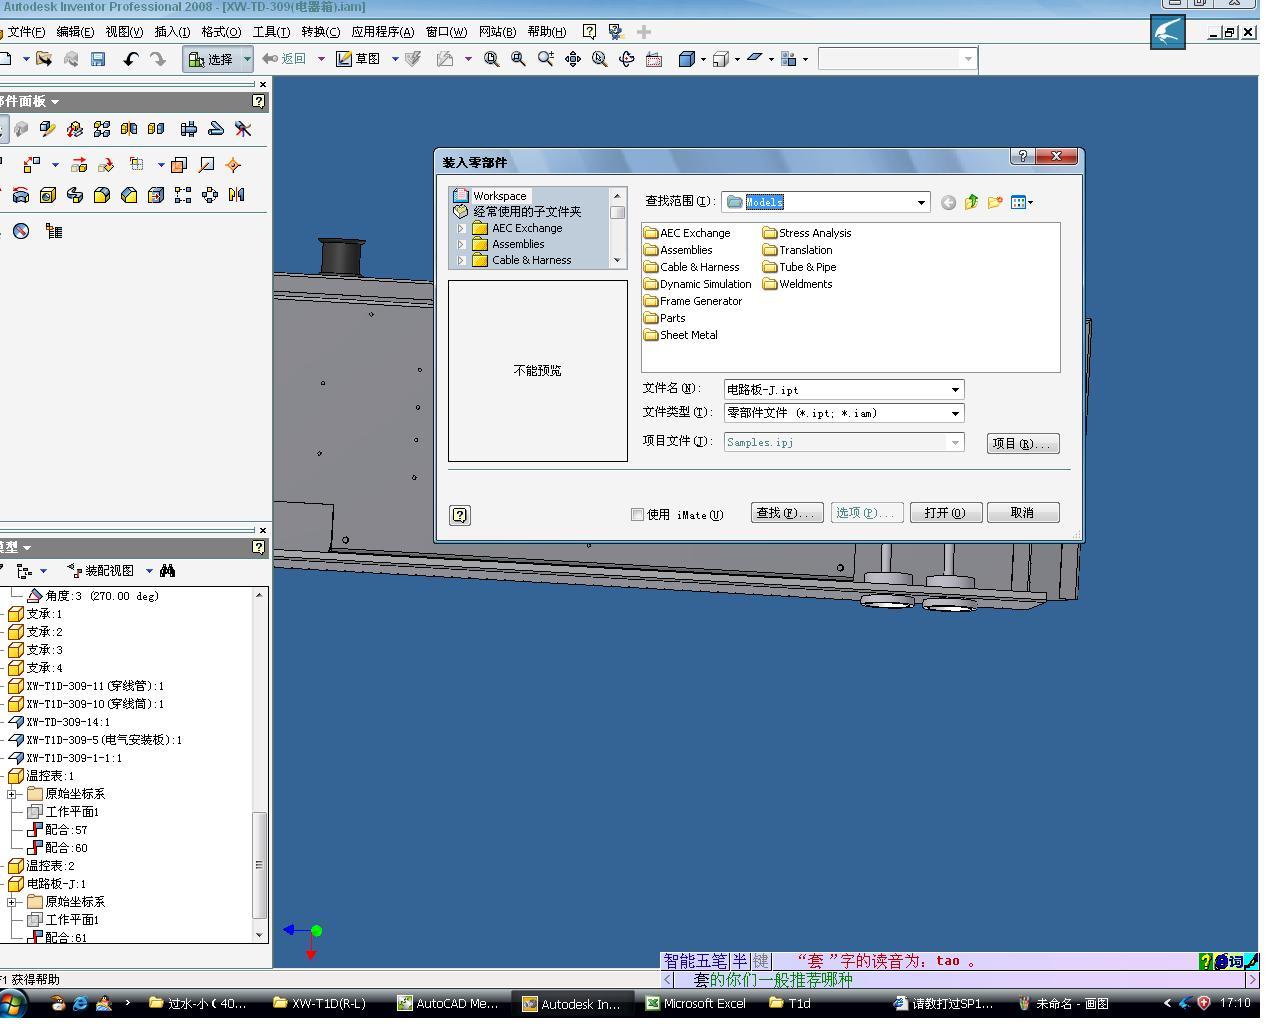 CAD软件技术学习交流区绘制打过SP1后请教cad2014墙体出现图片